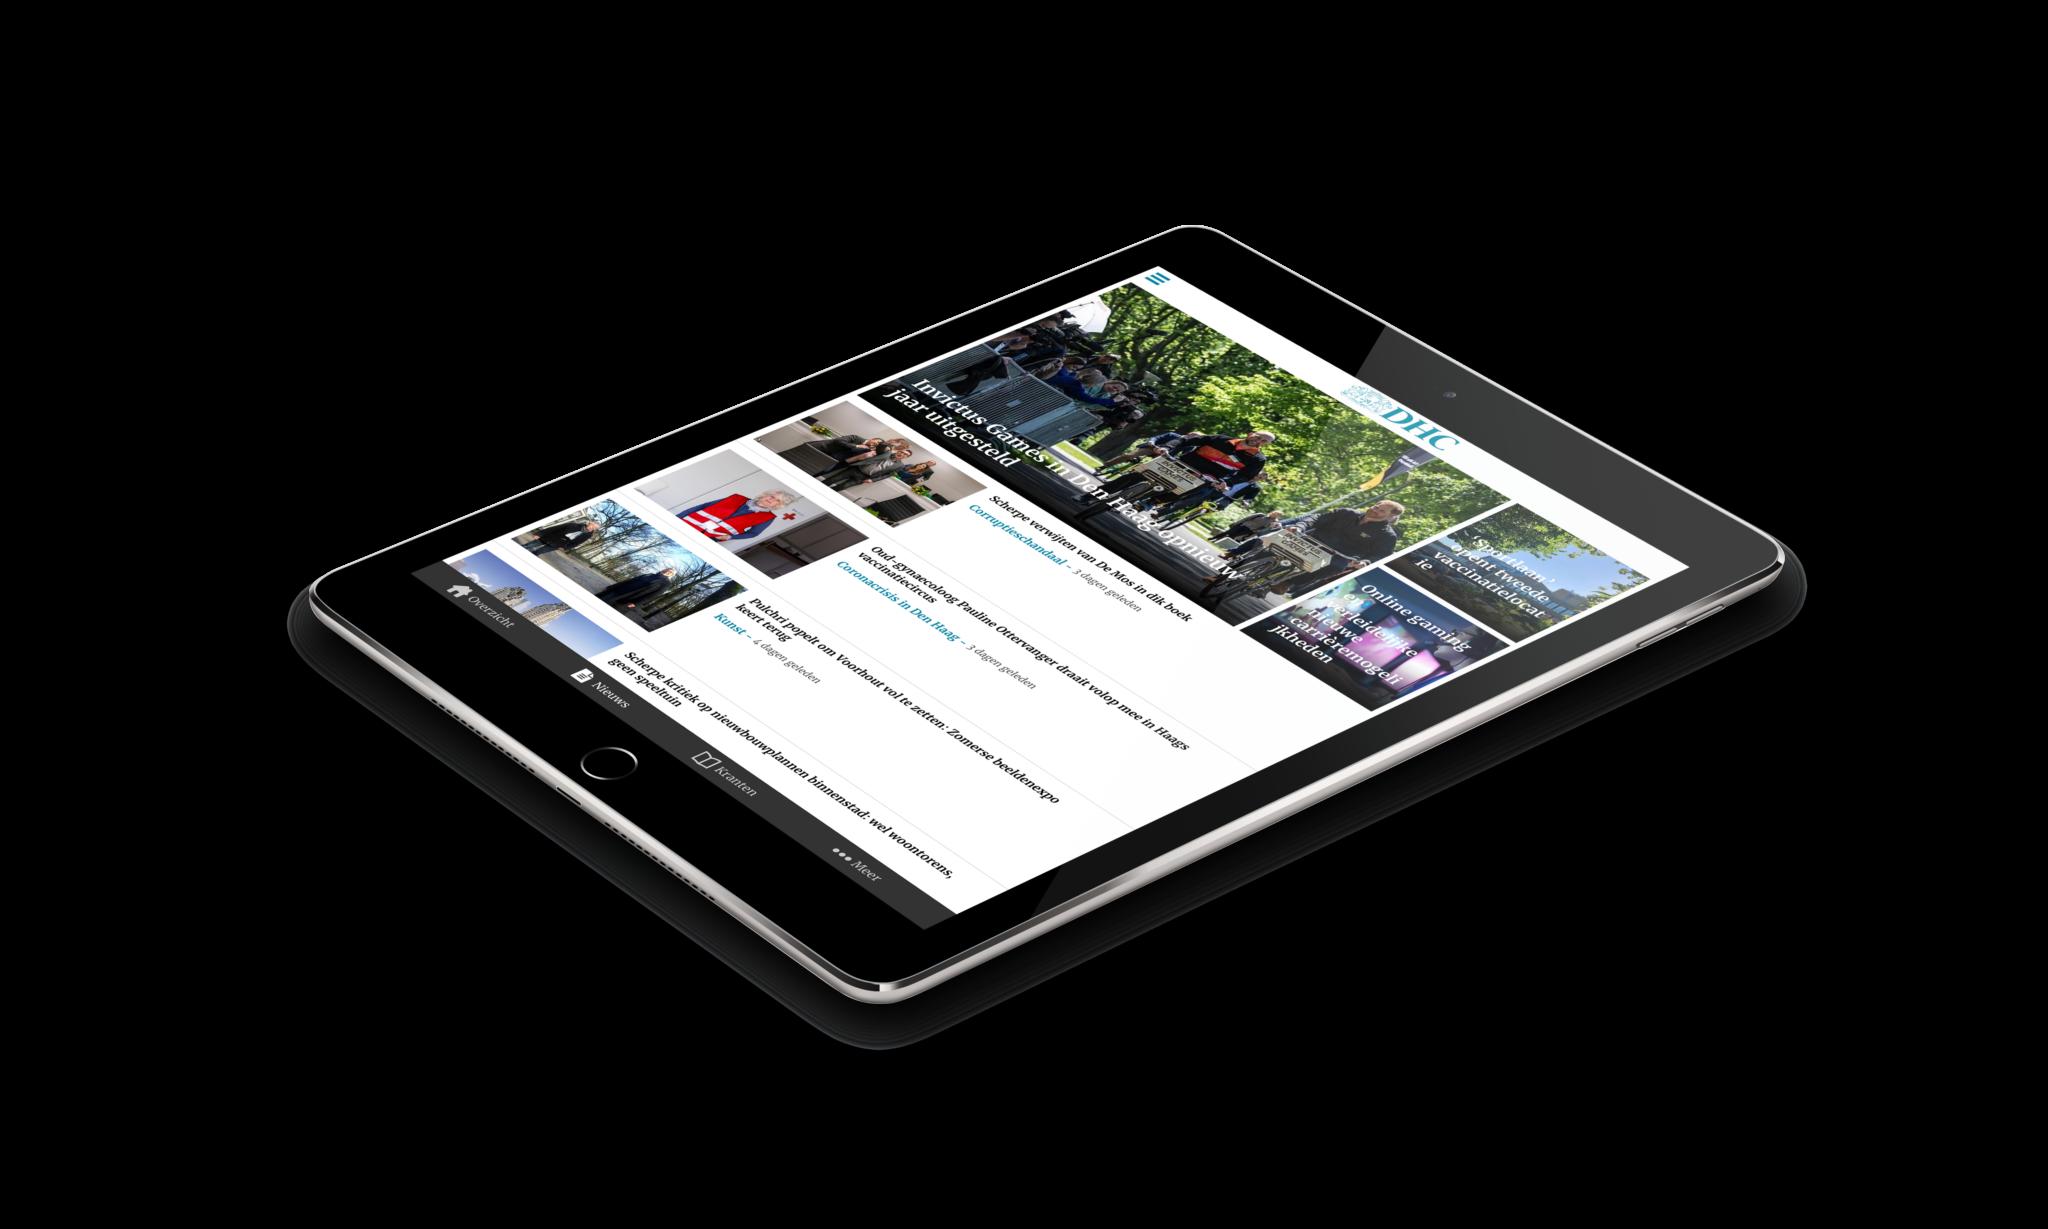 nieuws digitaal uitgeven digitale uitgevers